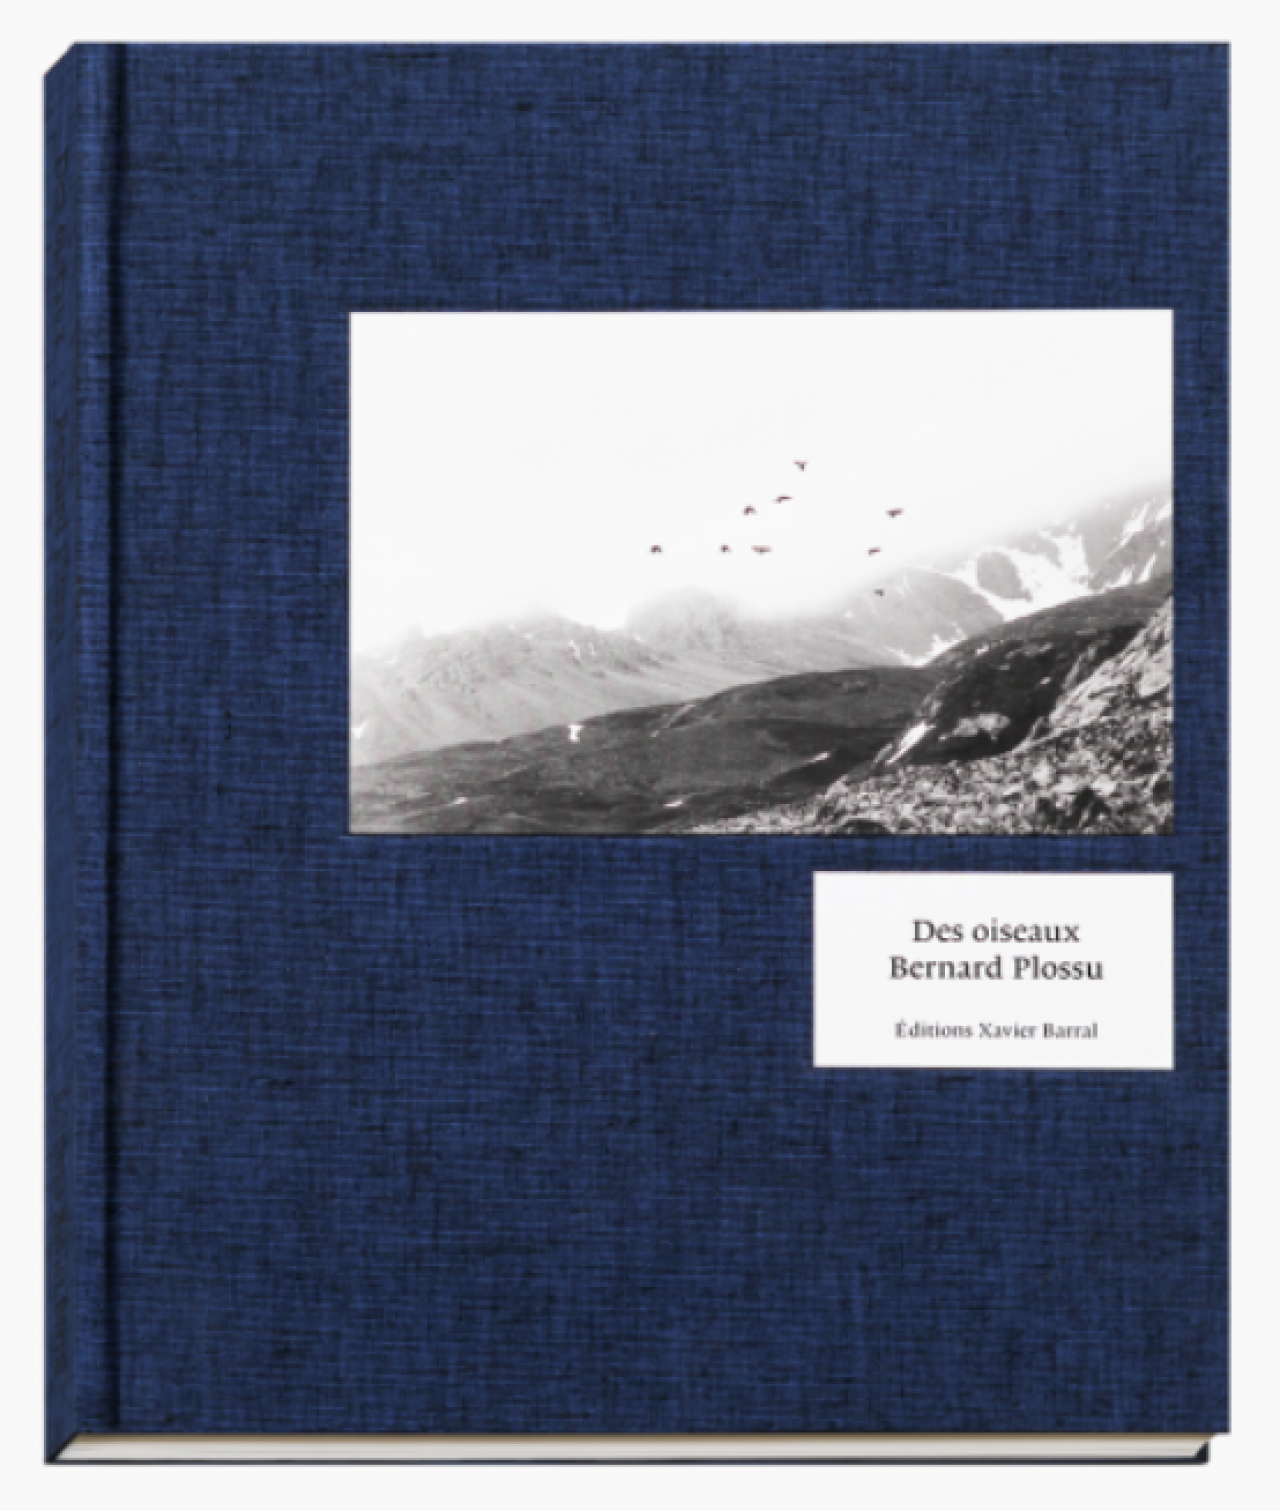 Bernard Plossu: Des Oiseaux